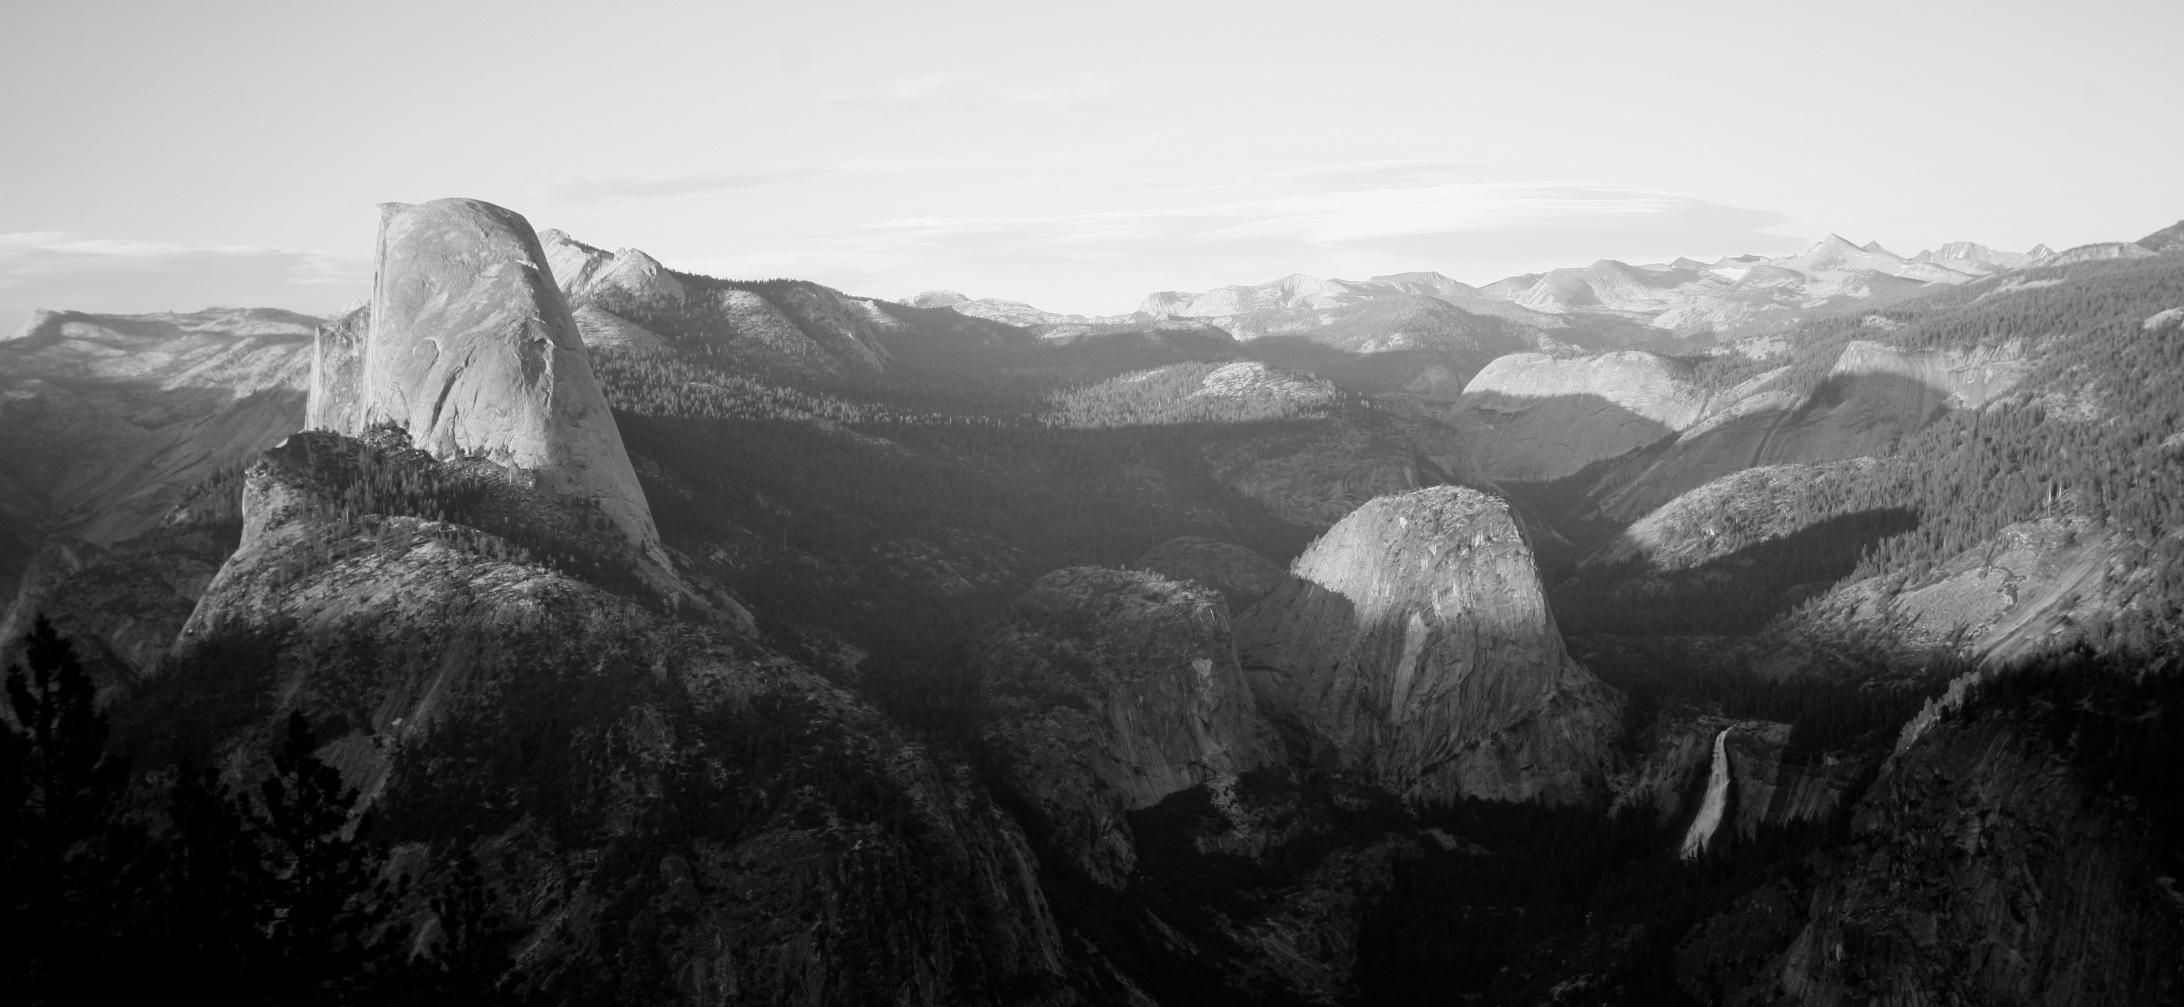 069_YosemiteLandscape.jpg